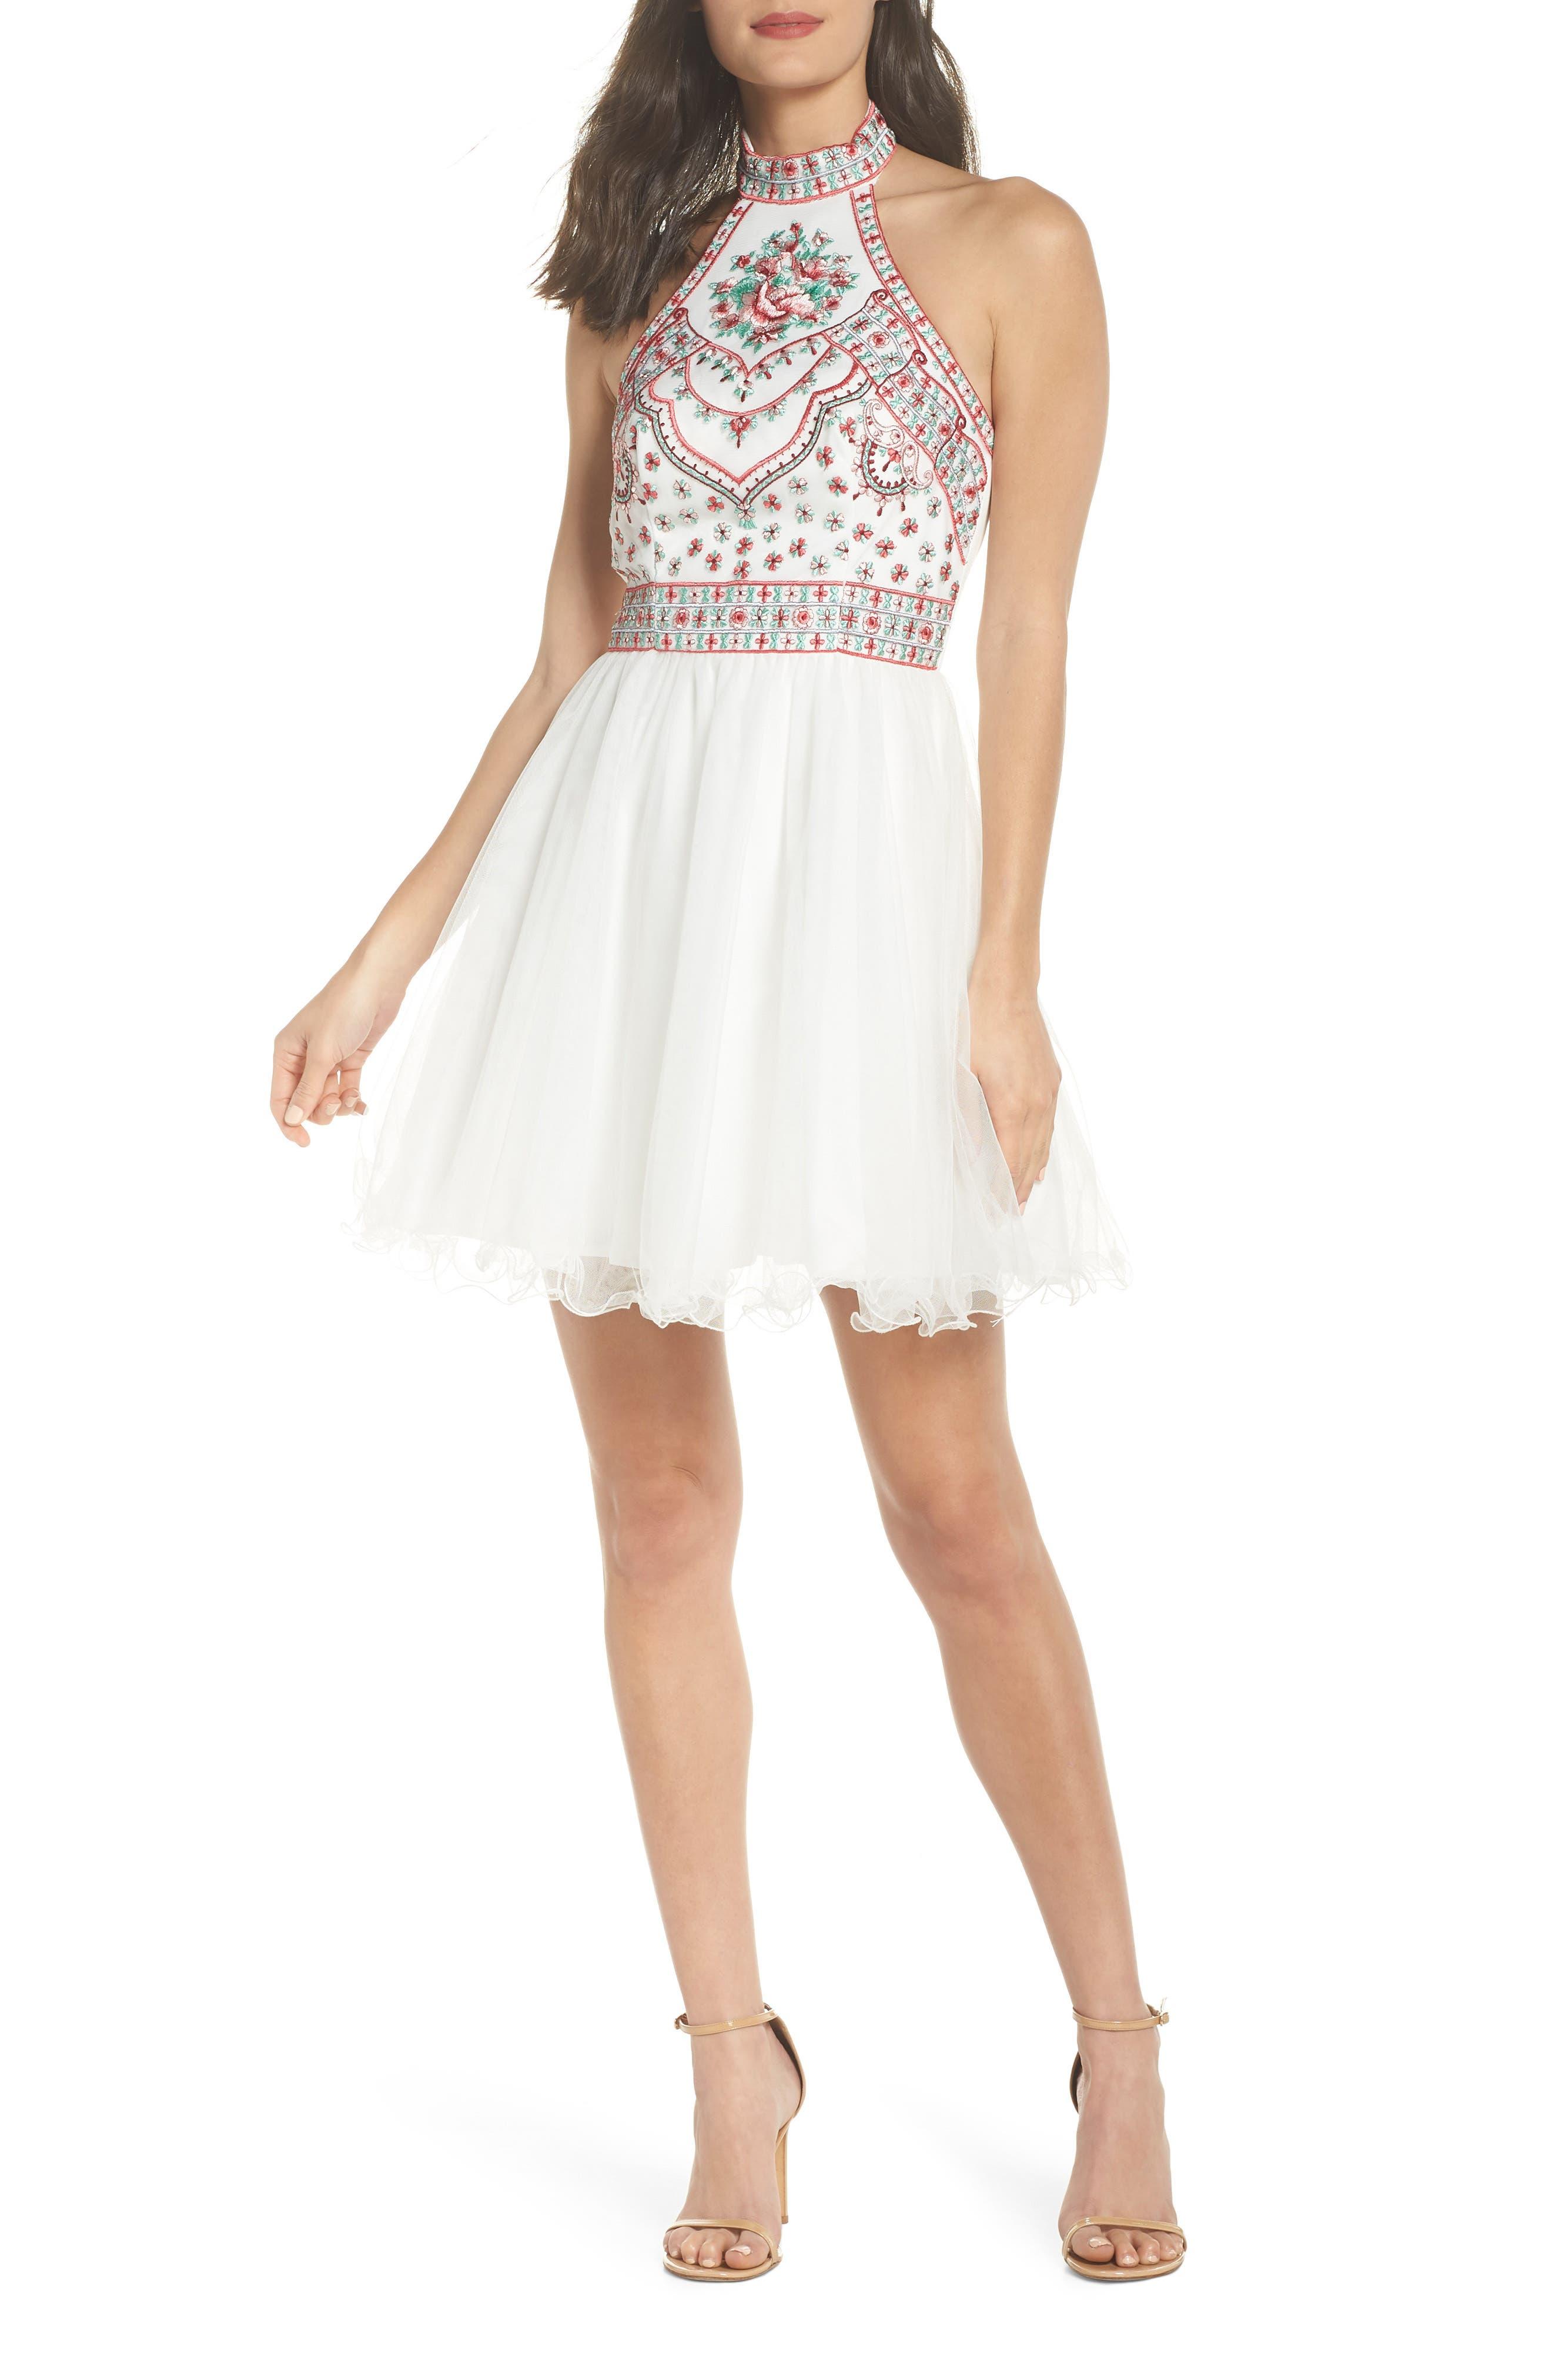 Blondie Nites Embroidered Fit & Flare Halter Dress, Ivory